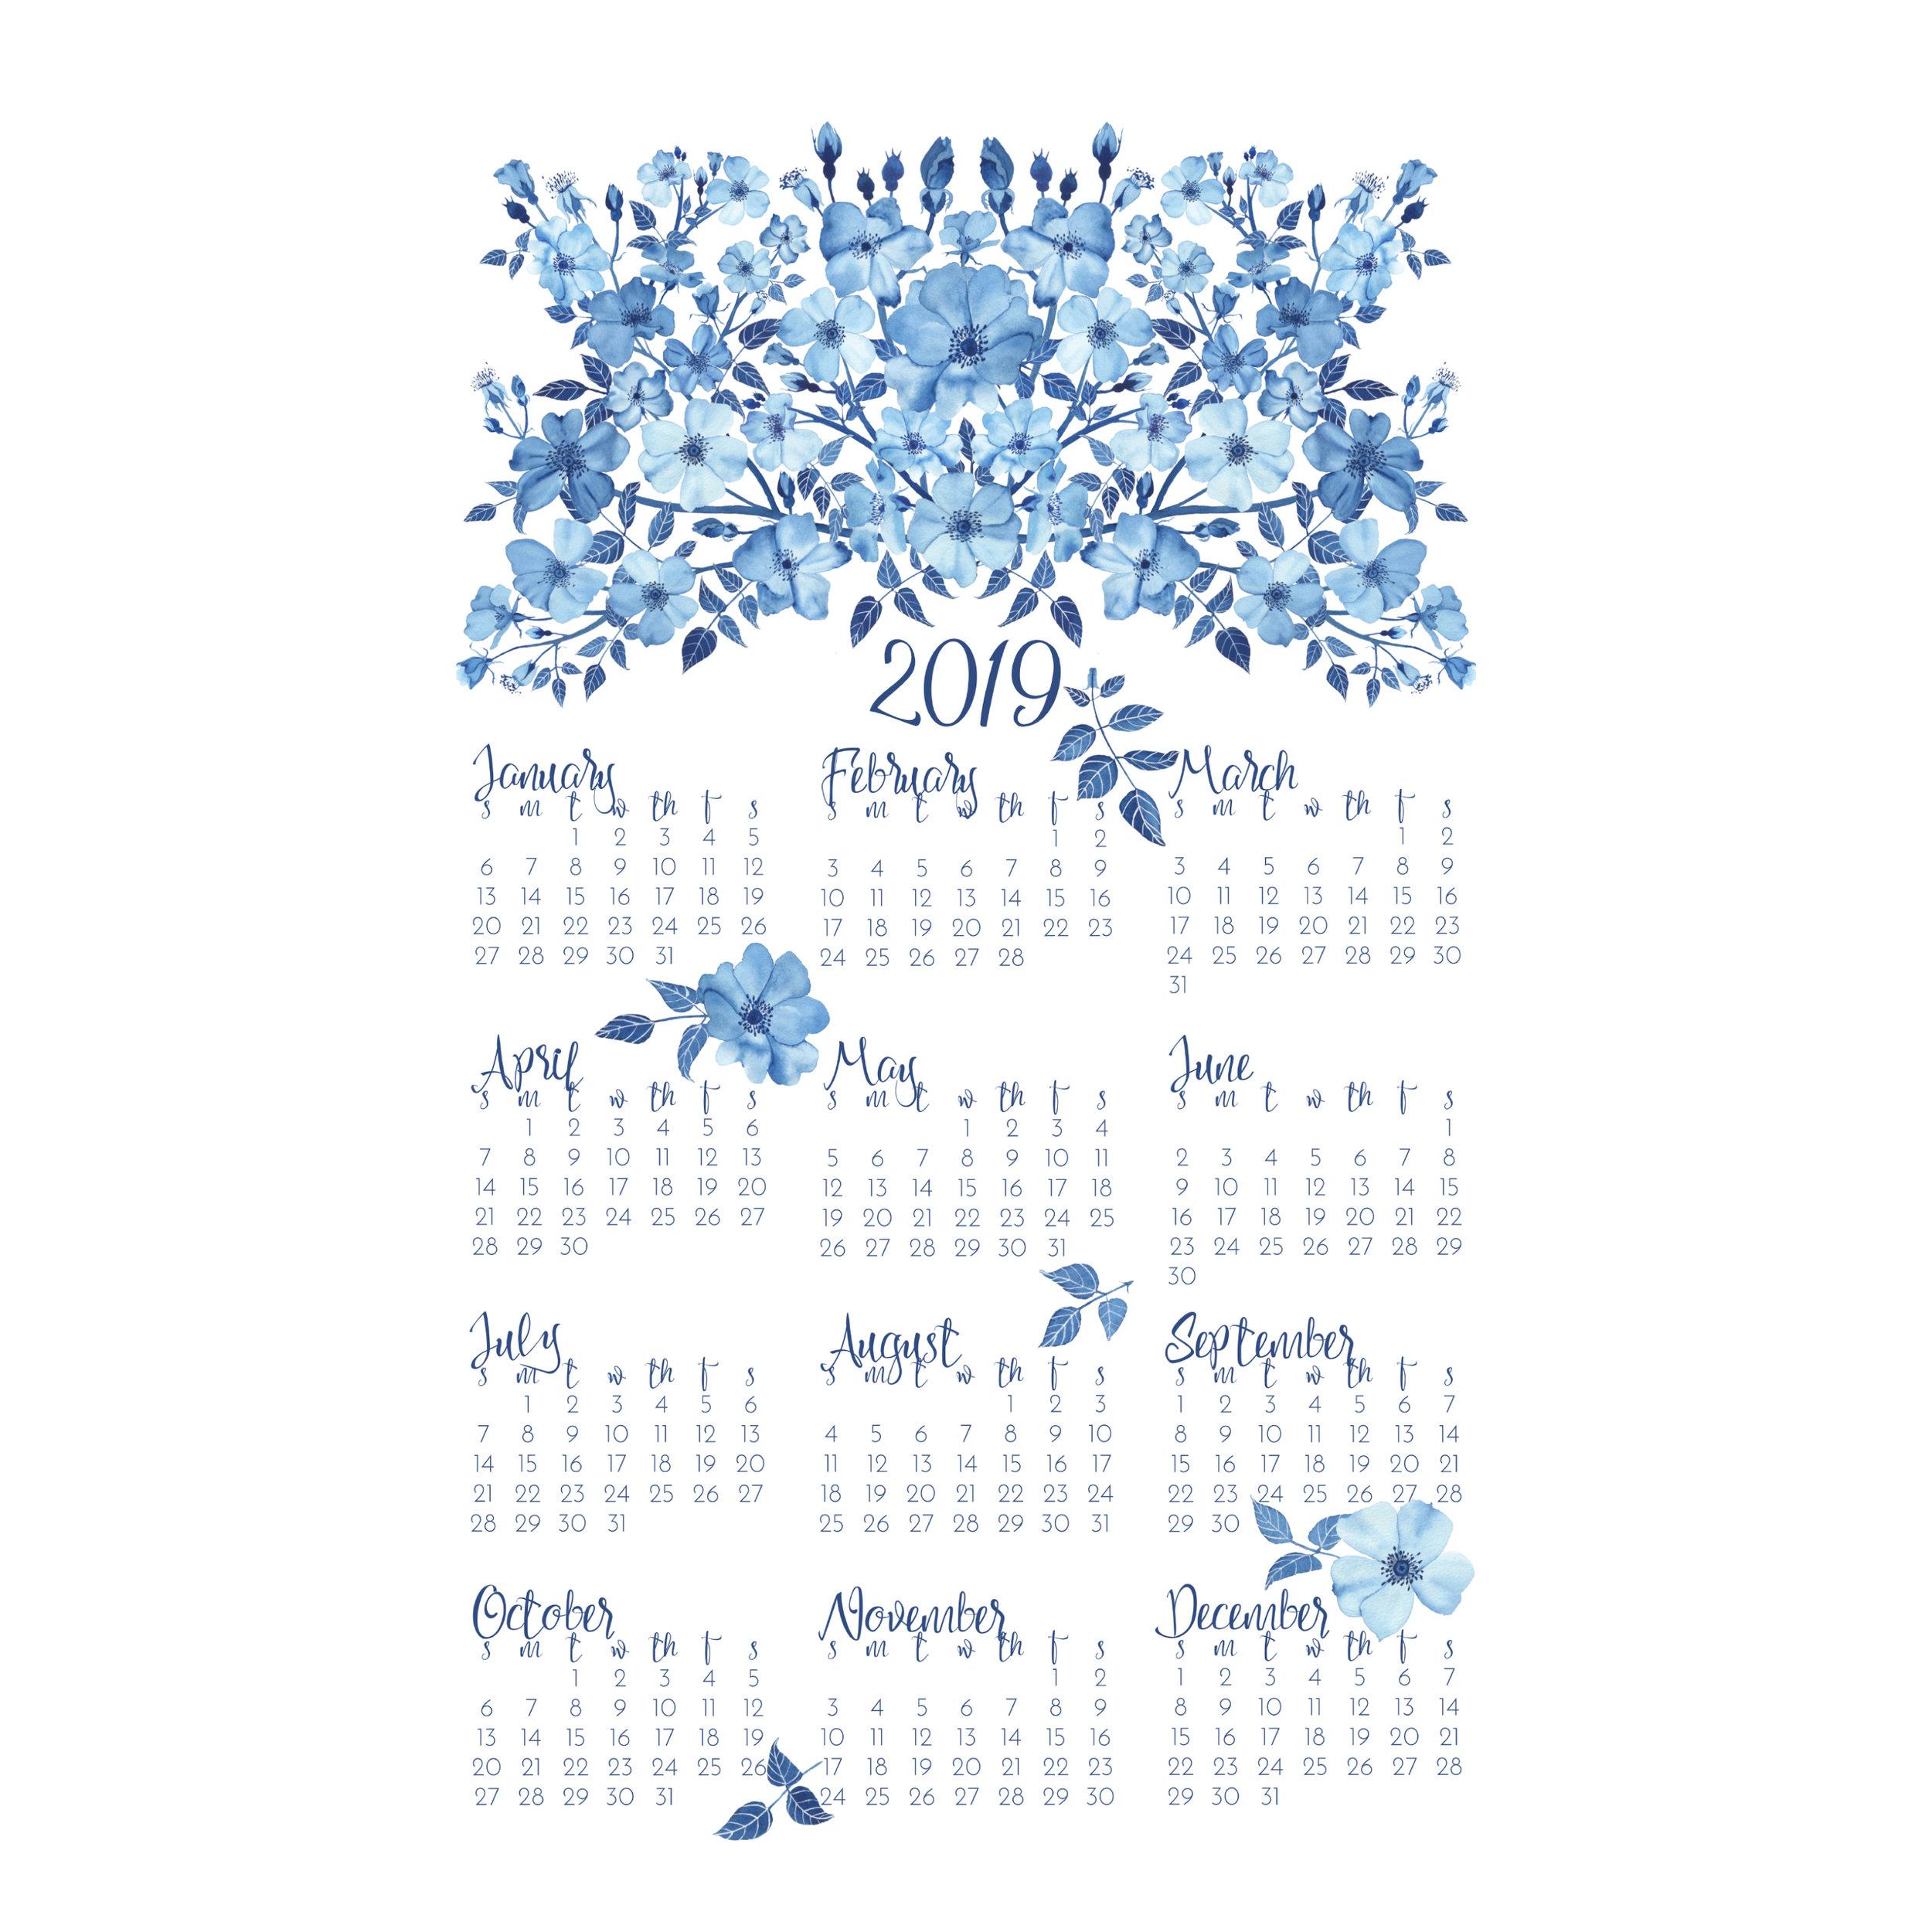 2019 Blue Roses Tea Towel Calendar design by Anne Butera